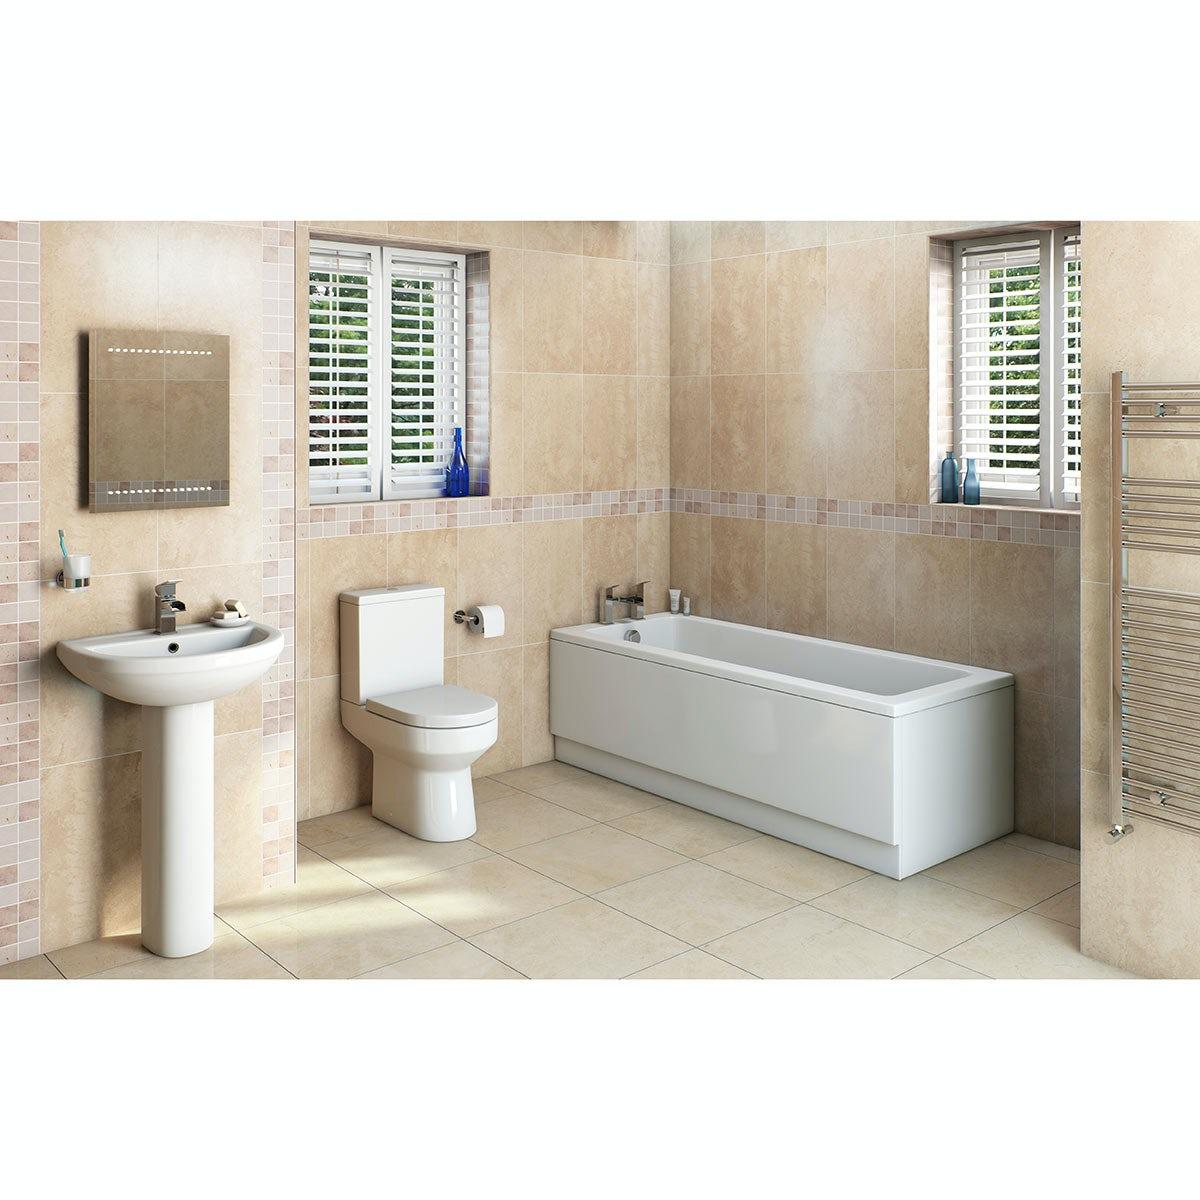 Oakley Bathroom Set With Kensington Bath 1700x700